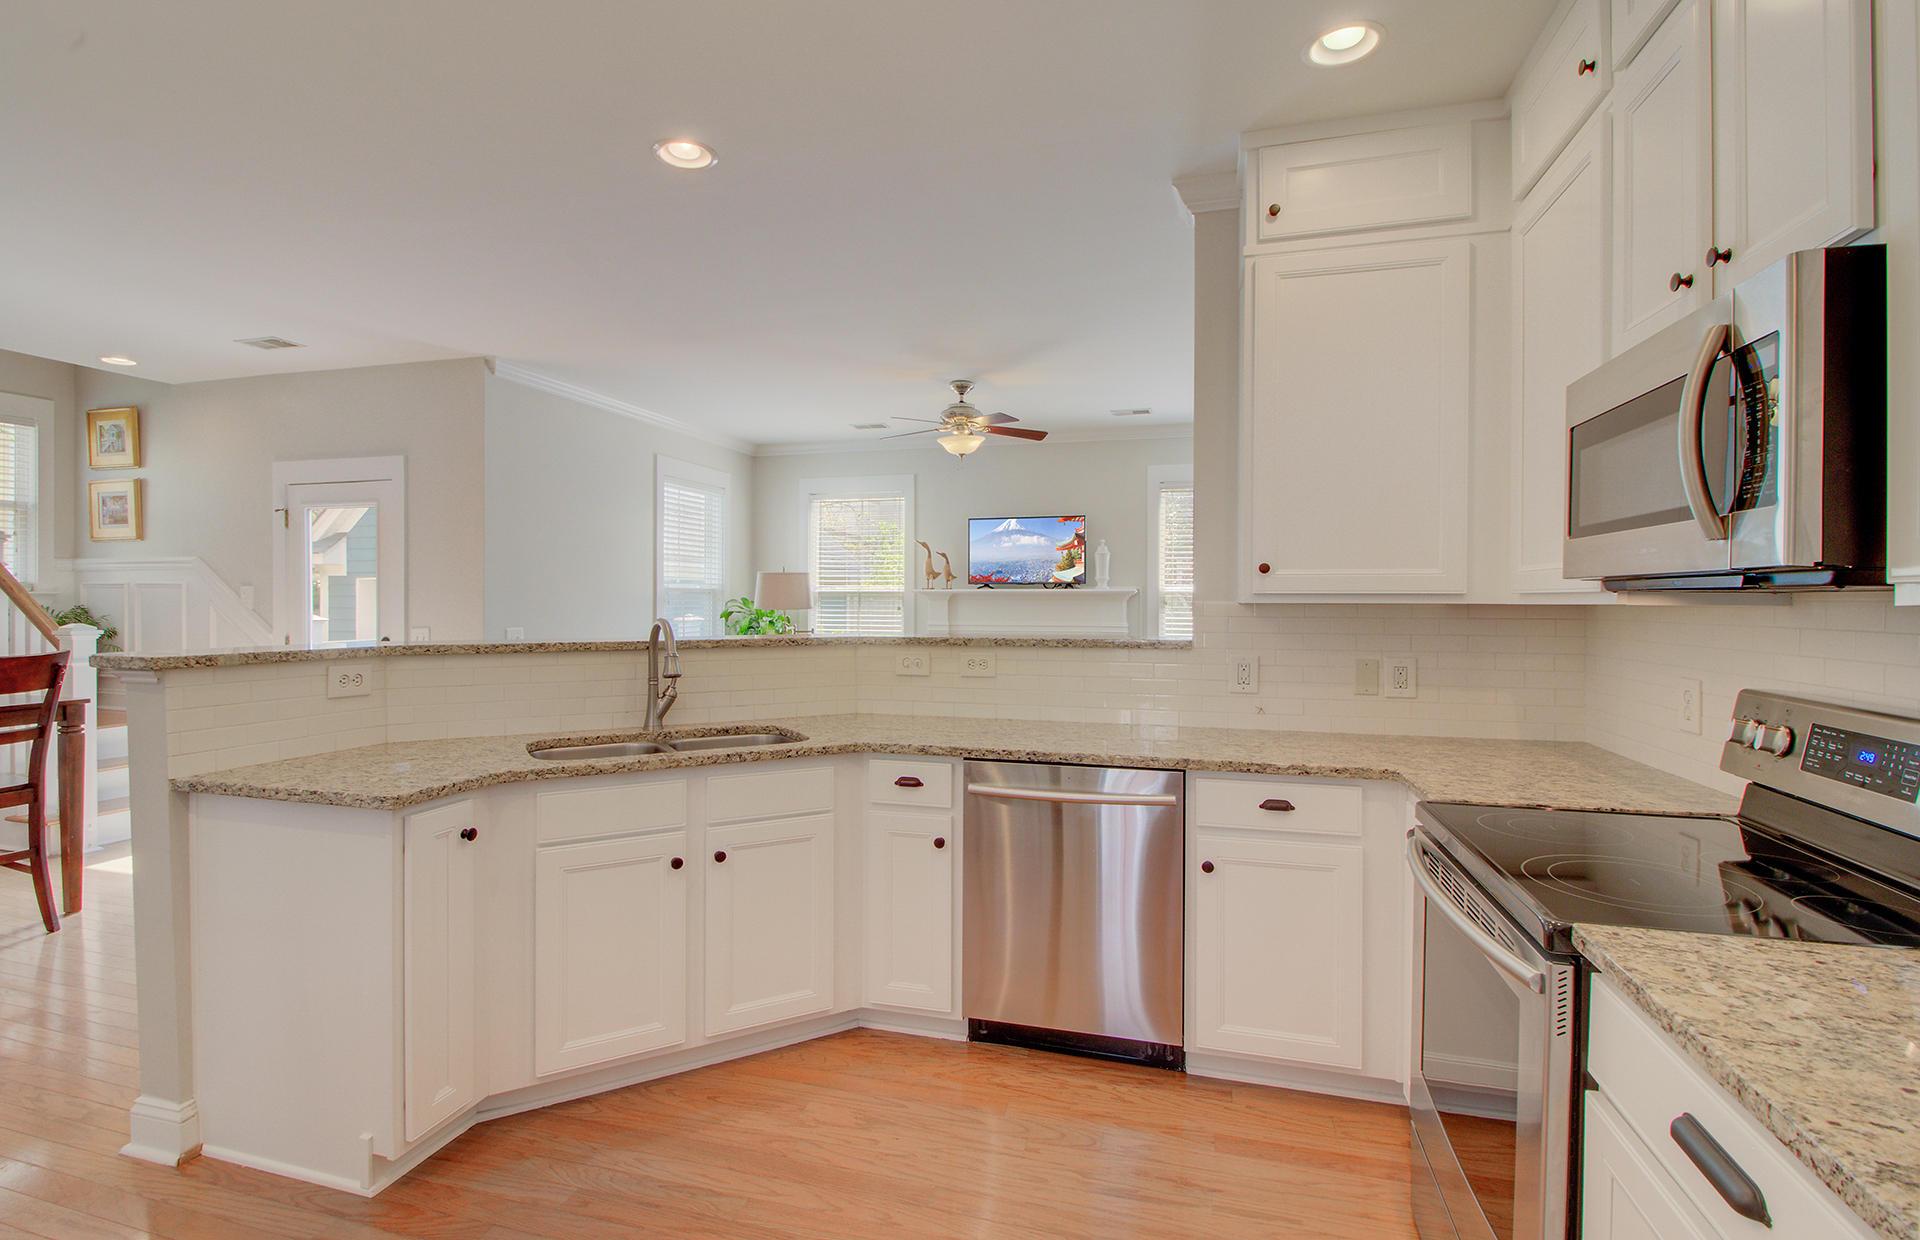 New Parrish Village Homes For Sale - 1109 Dawn View, Mount Pleasant, SC - 11